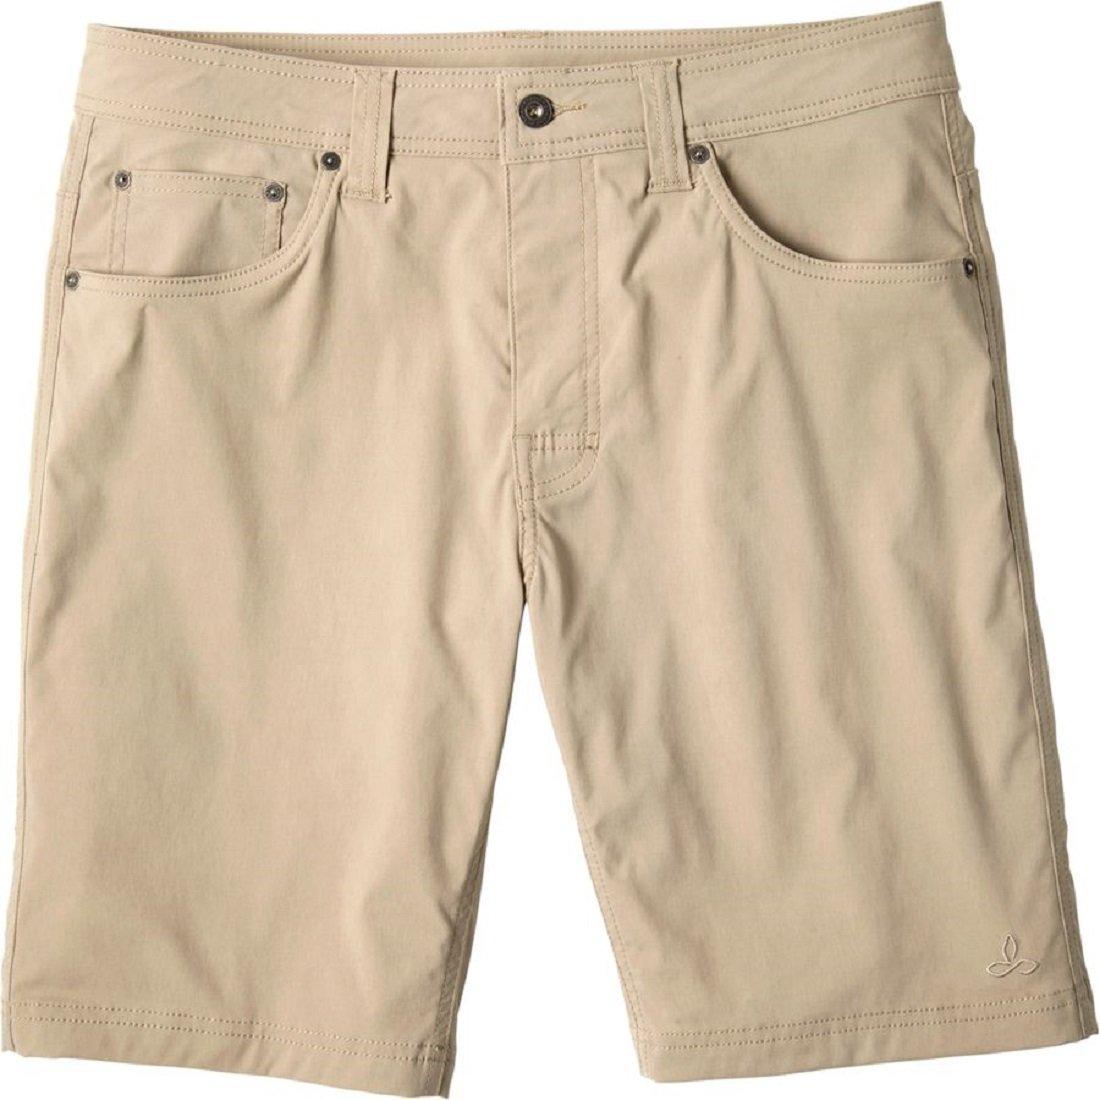 Prana Men's Brion Shorts (Dark Khaki, Size 40)